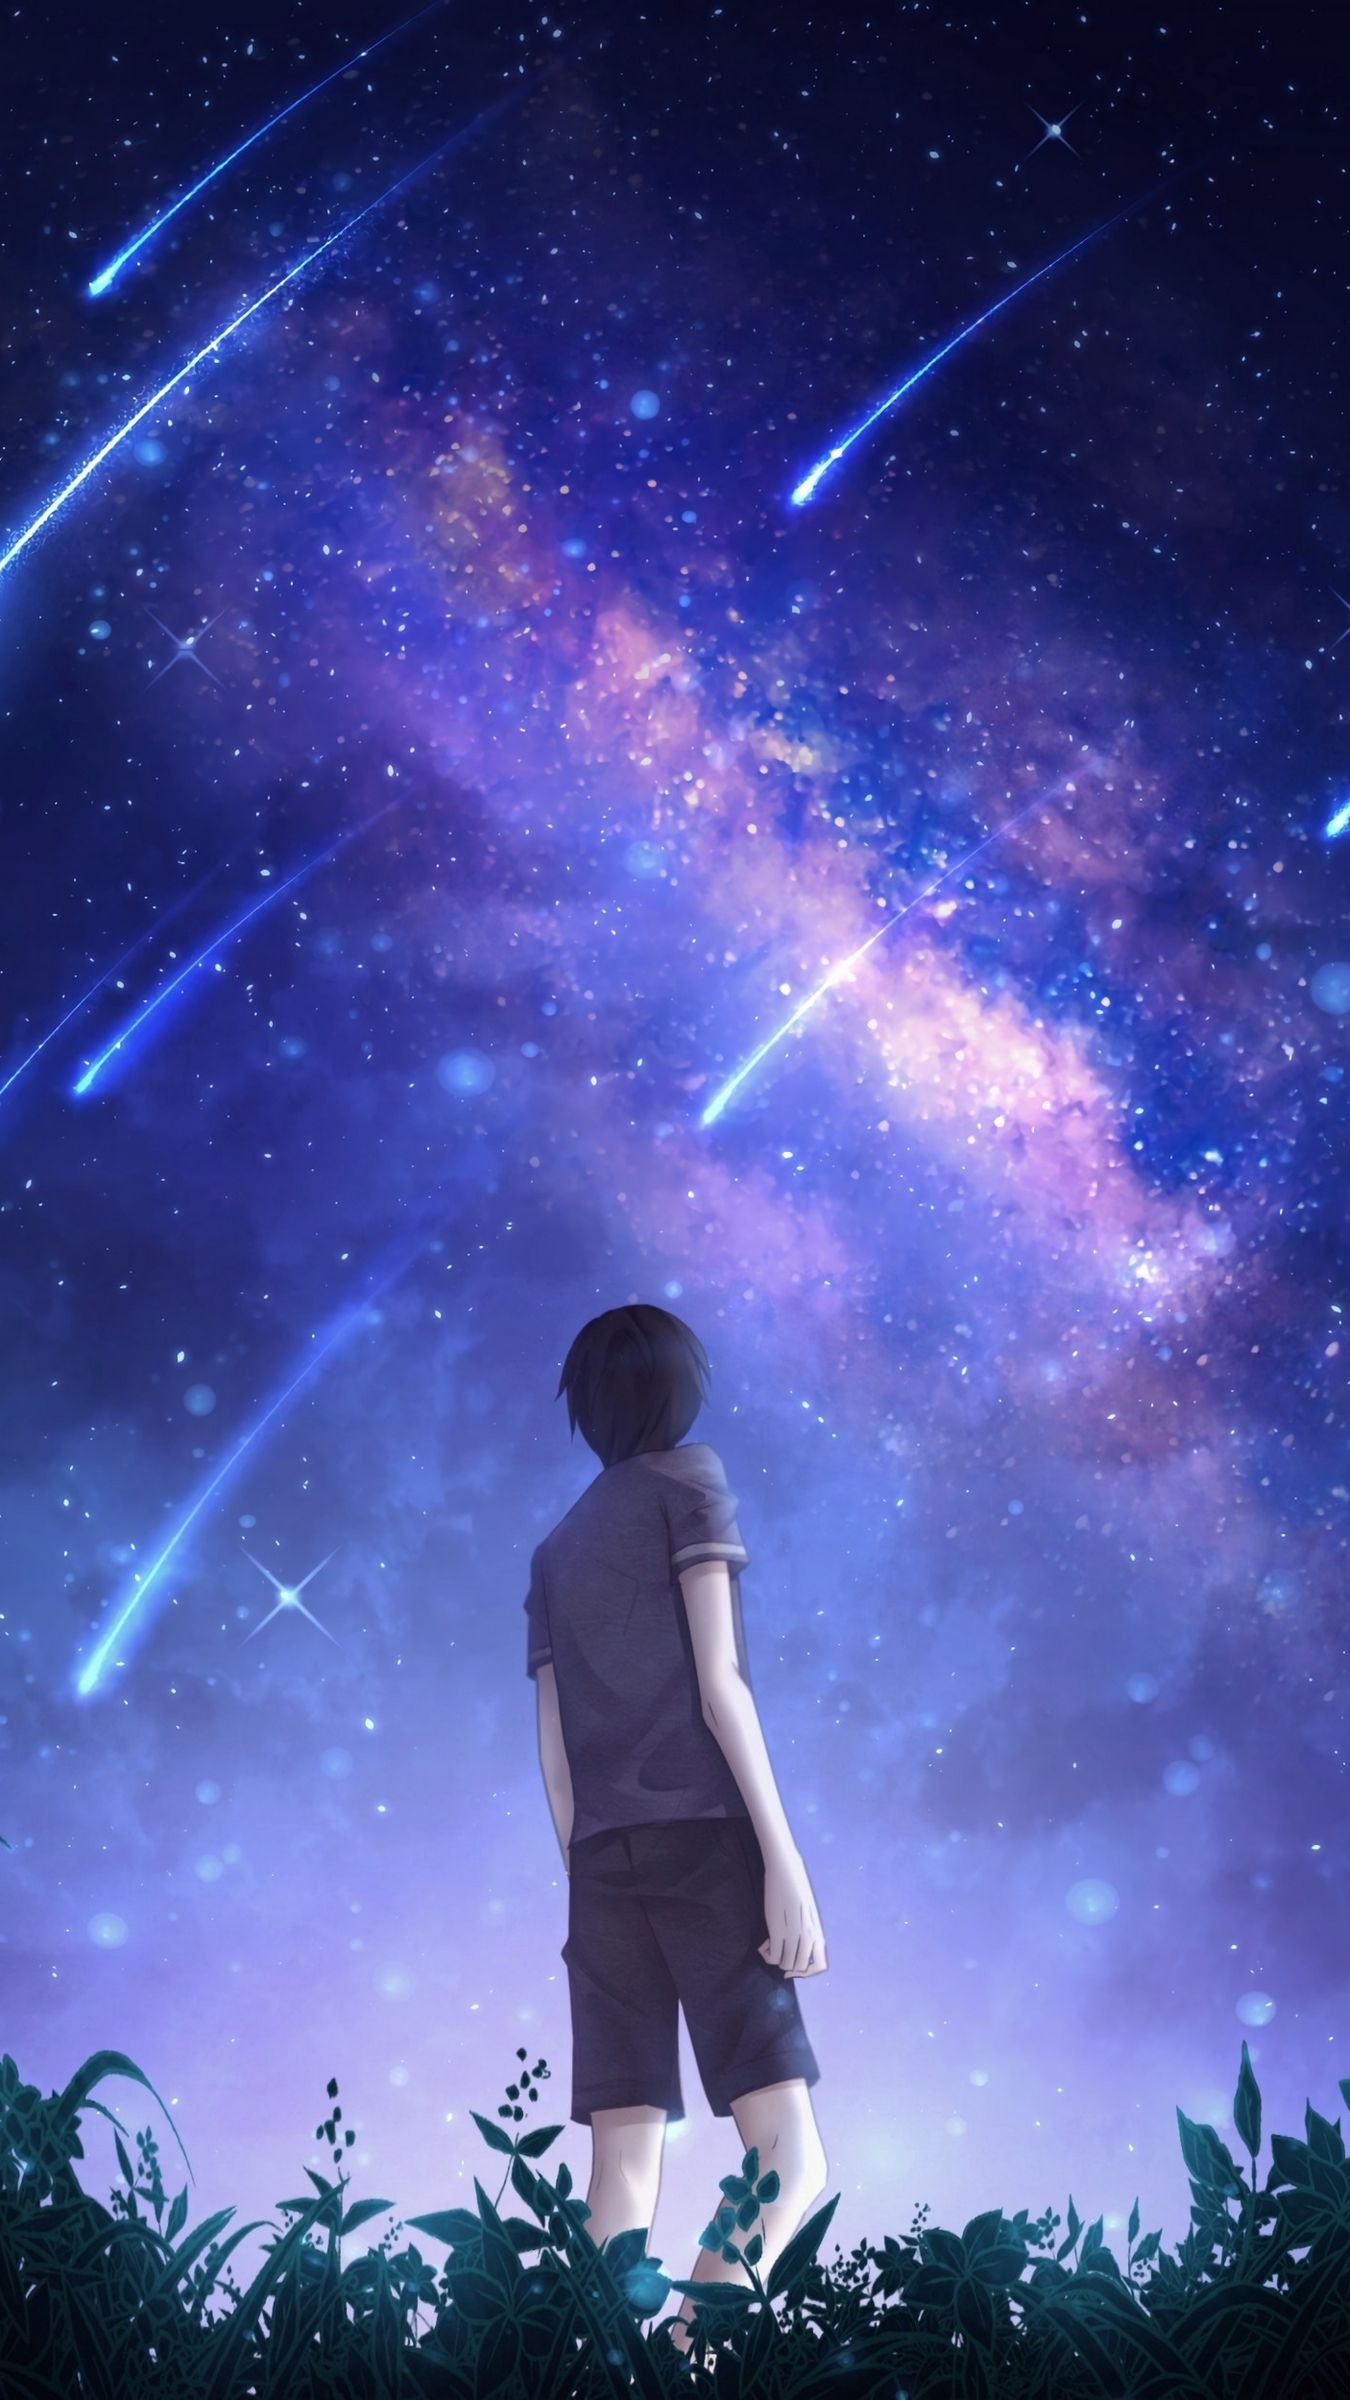 Silhouette Starry Sky Meteors Starfall Night Art Wallpaper Background Iphone 11 X 12 Xs In 2021 Sky Anime Silhouette Art Anime Backgrounds Wallpapers Iphone anime night sky wallpaper hd